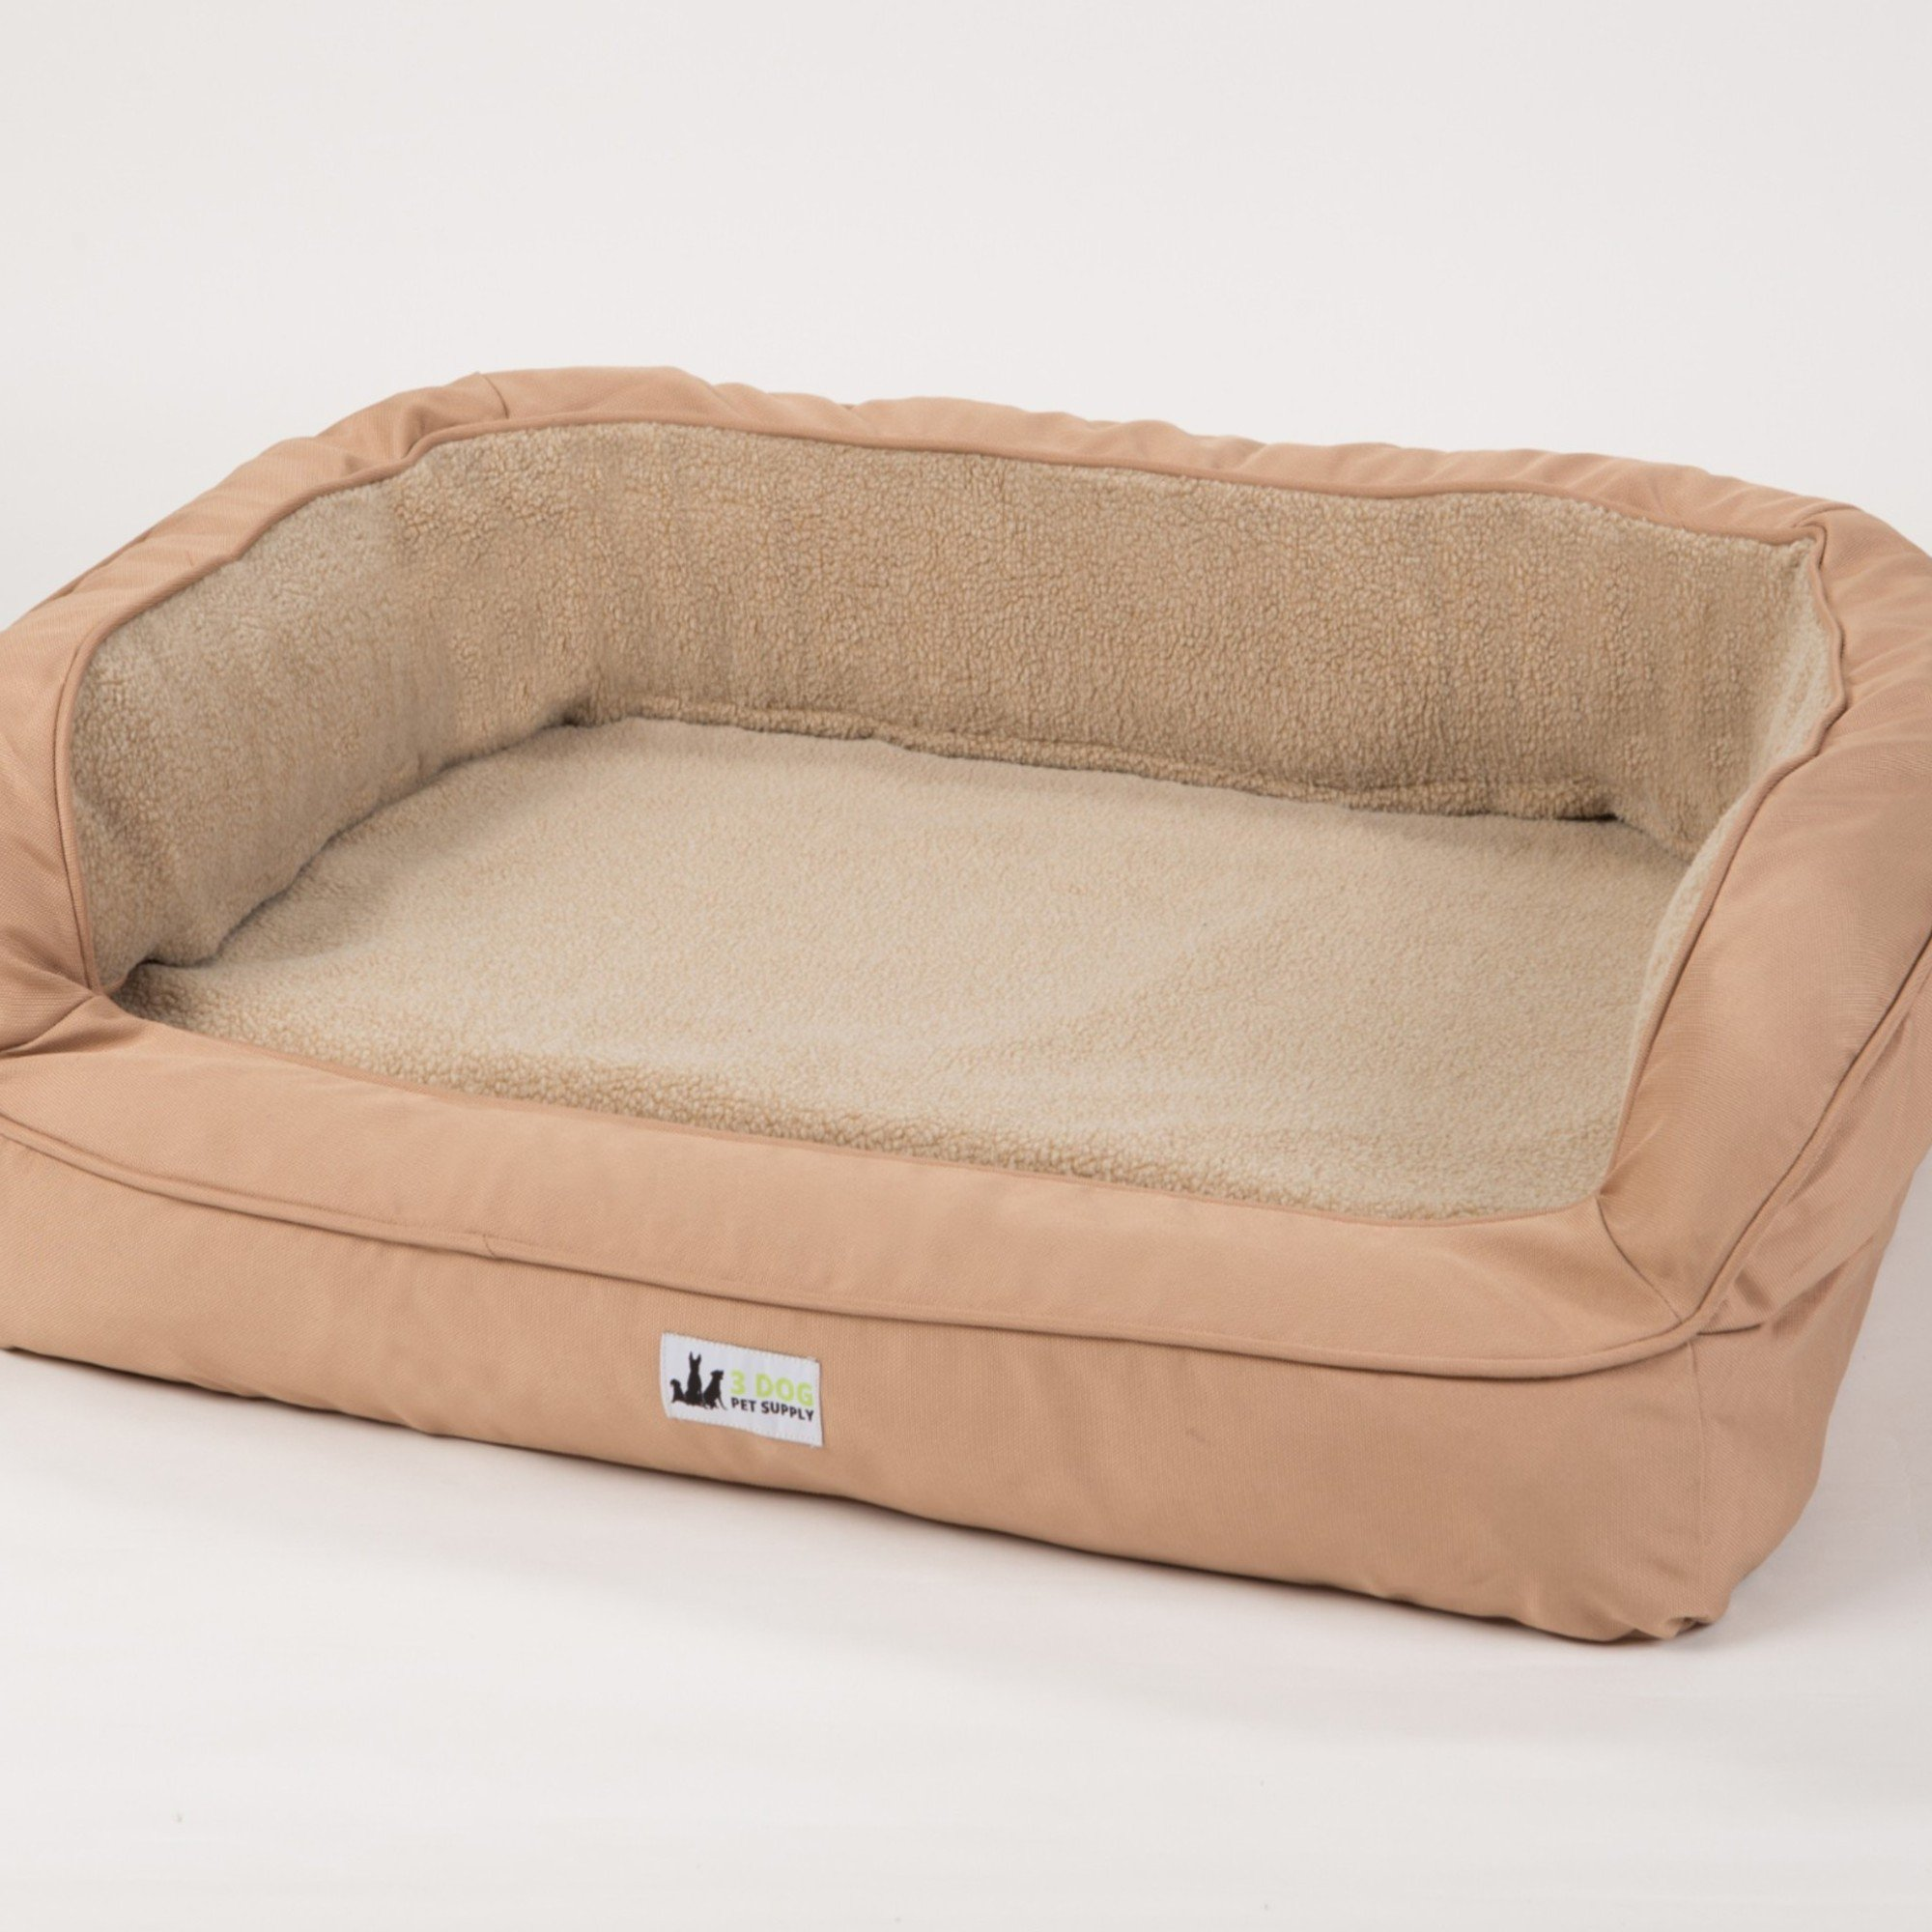 "3 Dog EZ Wash Fleece Bolster Tan Dog Bed, 32"" L X 21"" W X 9"" H, Small"